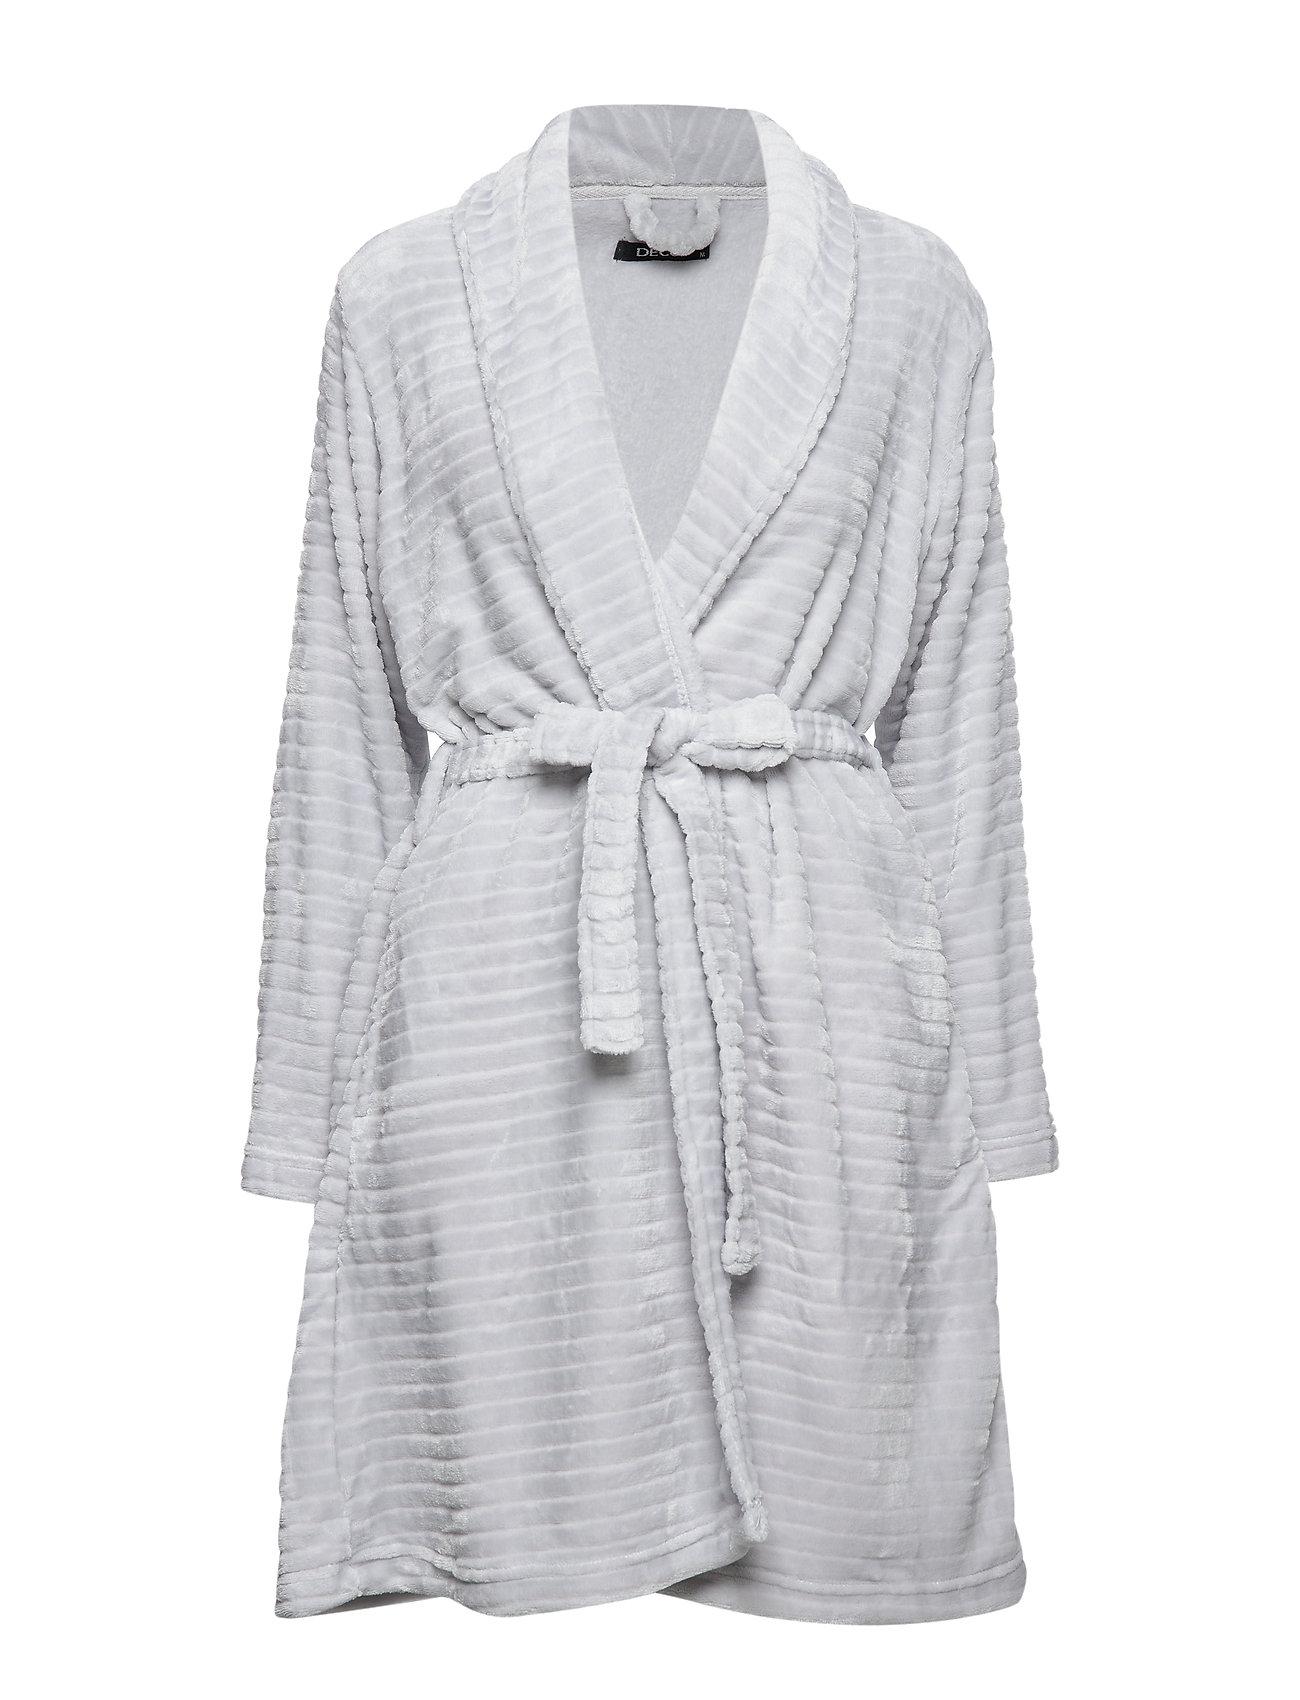 Decoy DECOY short robe w/stripes - HARBOR MIS